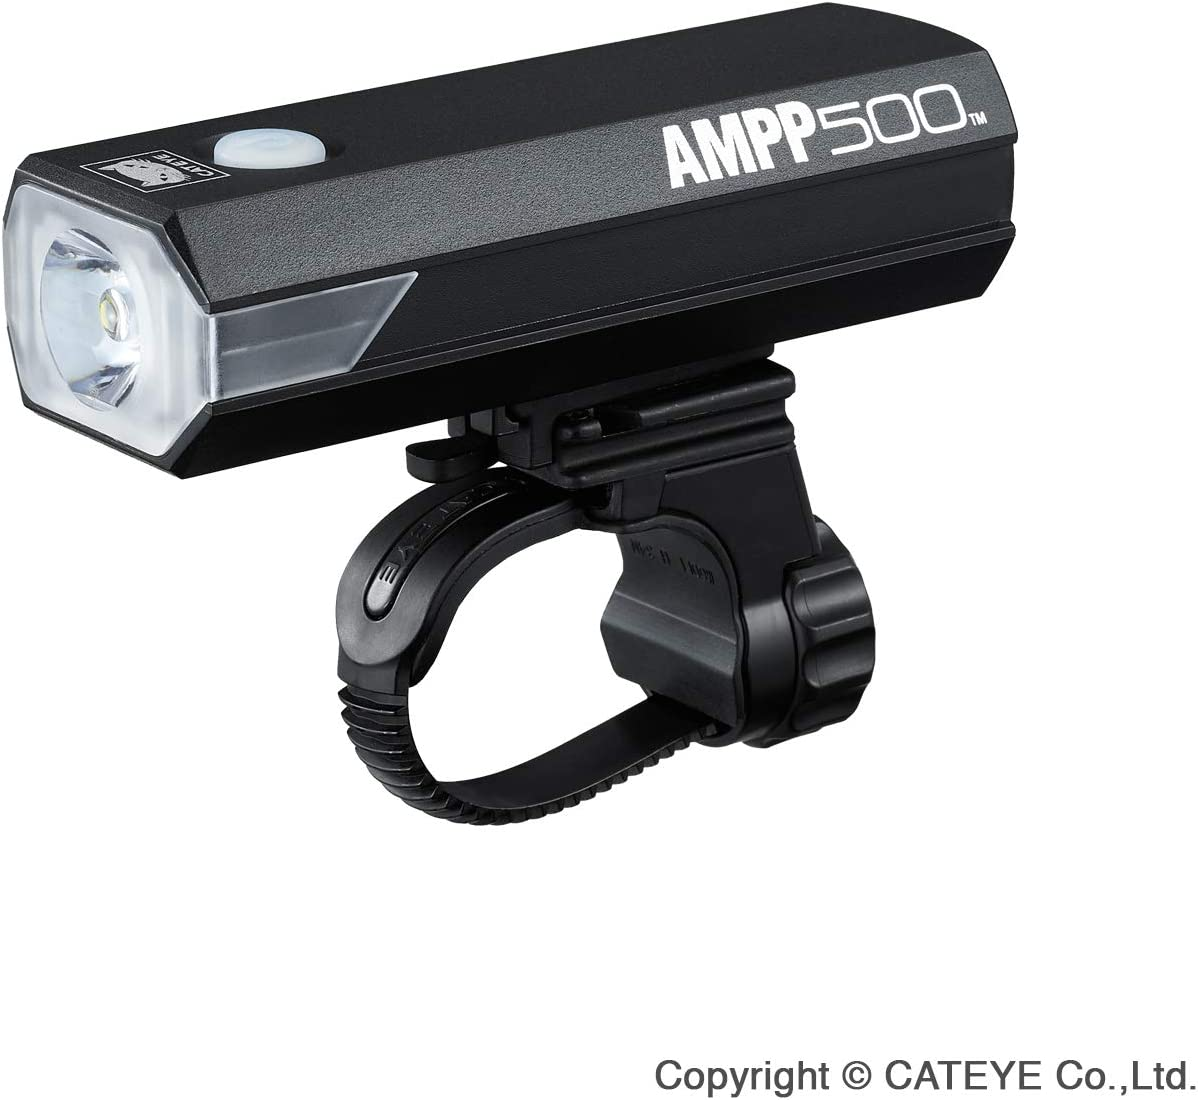 CatEye Ampp 500 Front Luz para Bicicleta, Unisex Adulto, Negro, Talla única